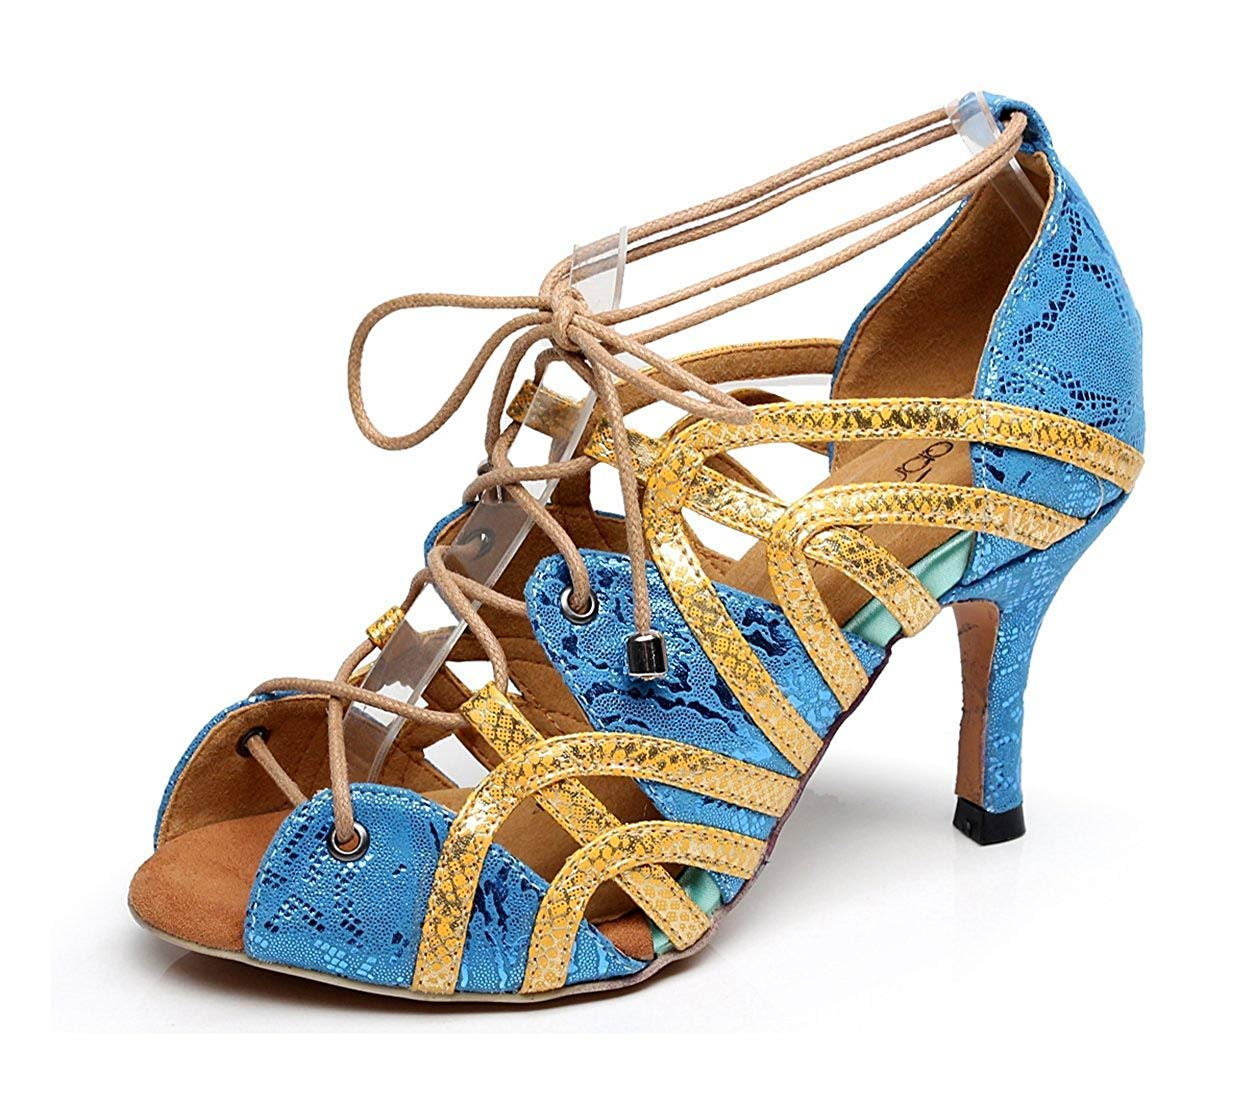 Qiusa Damen Soft Rubber Sole Peep Toe Blau Synthetische Salsa Latin Tanzschuhe Party Sandalen UK 5 (Farbe   - Größe   -)